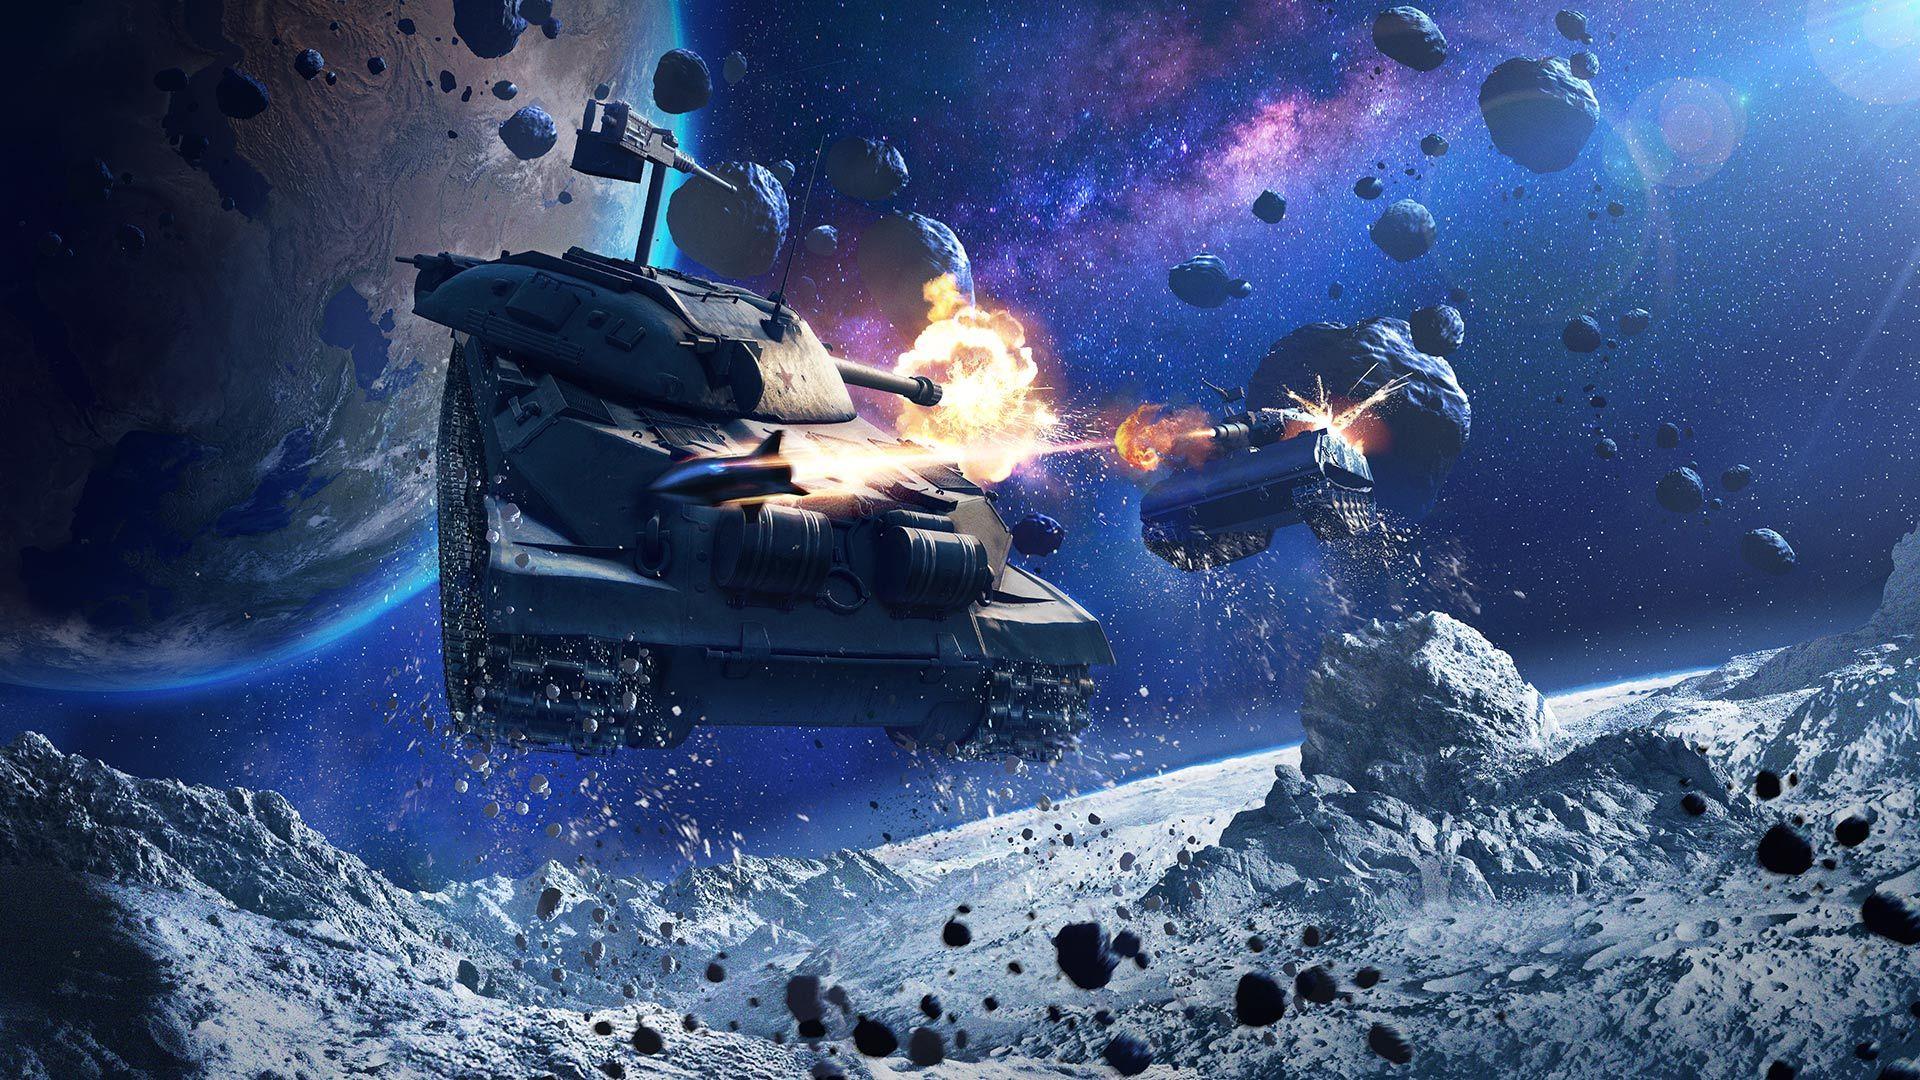 World of Tanks Blitz летит на Луну: режим «Гравитация» возвращается